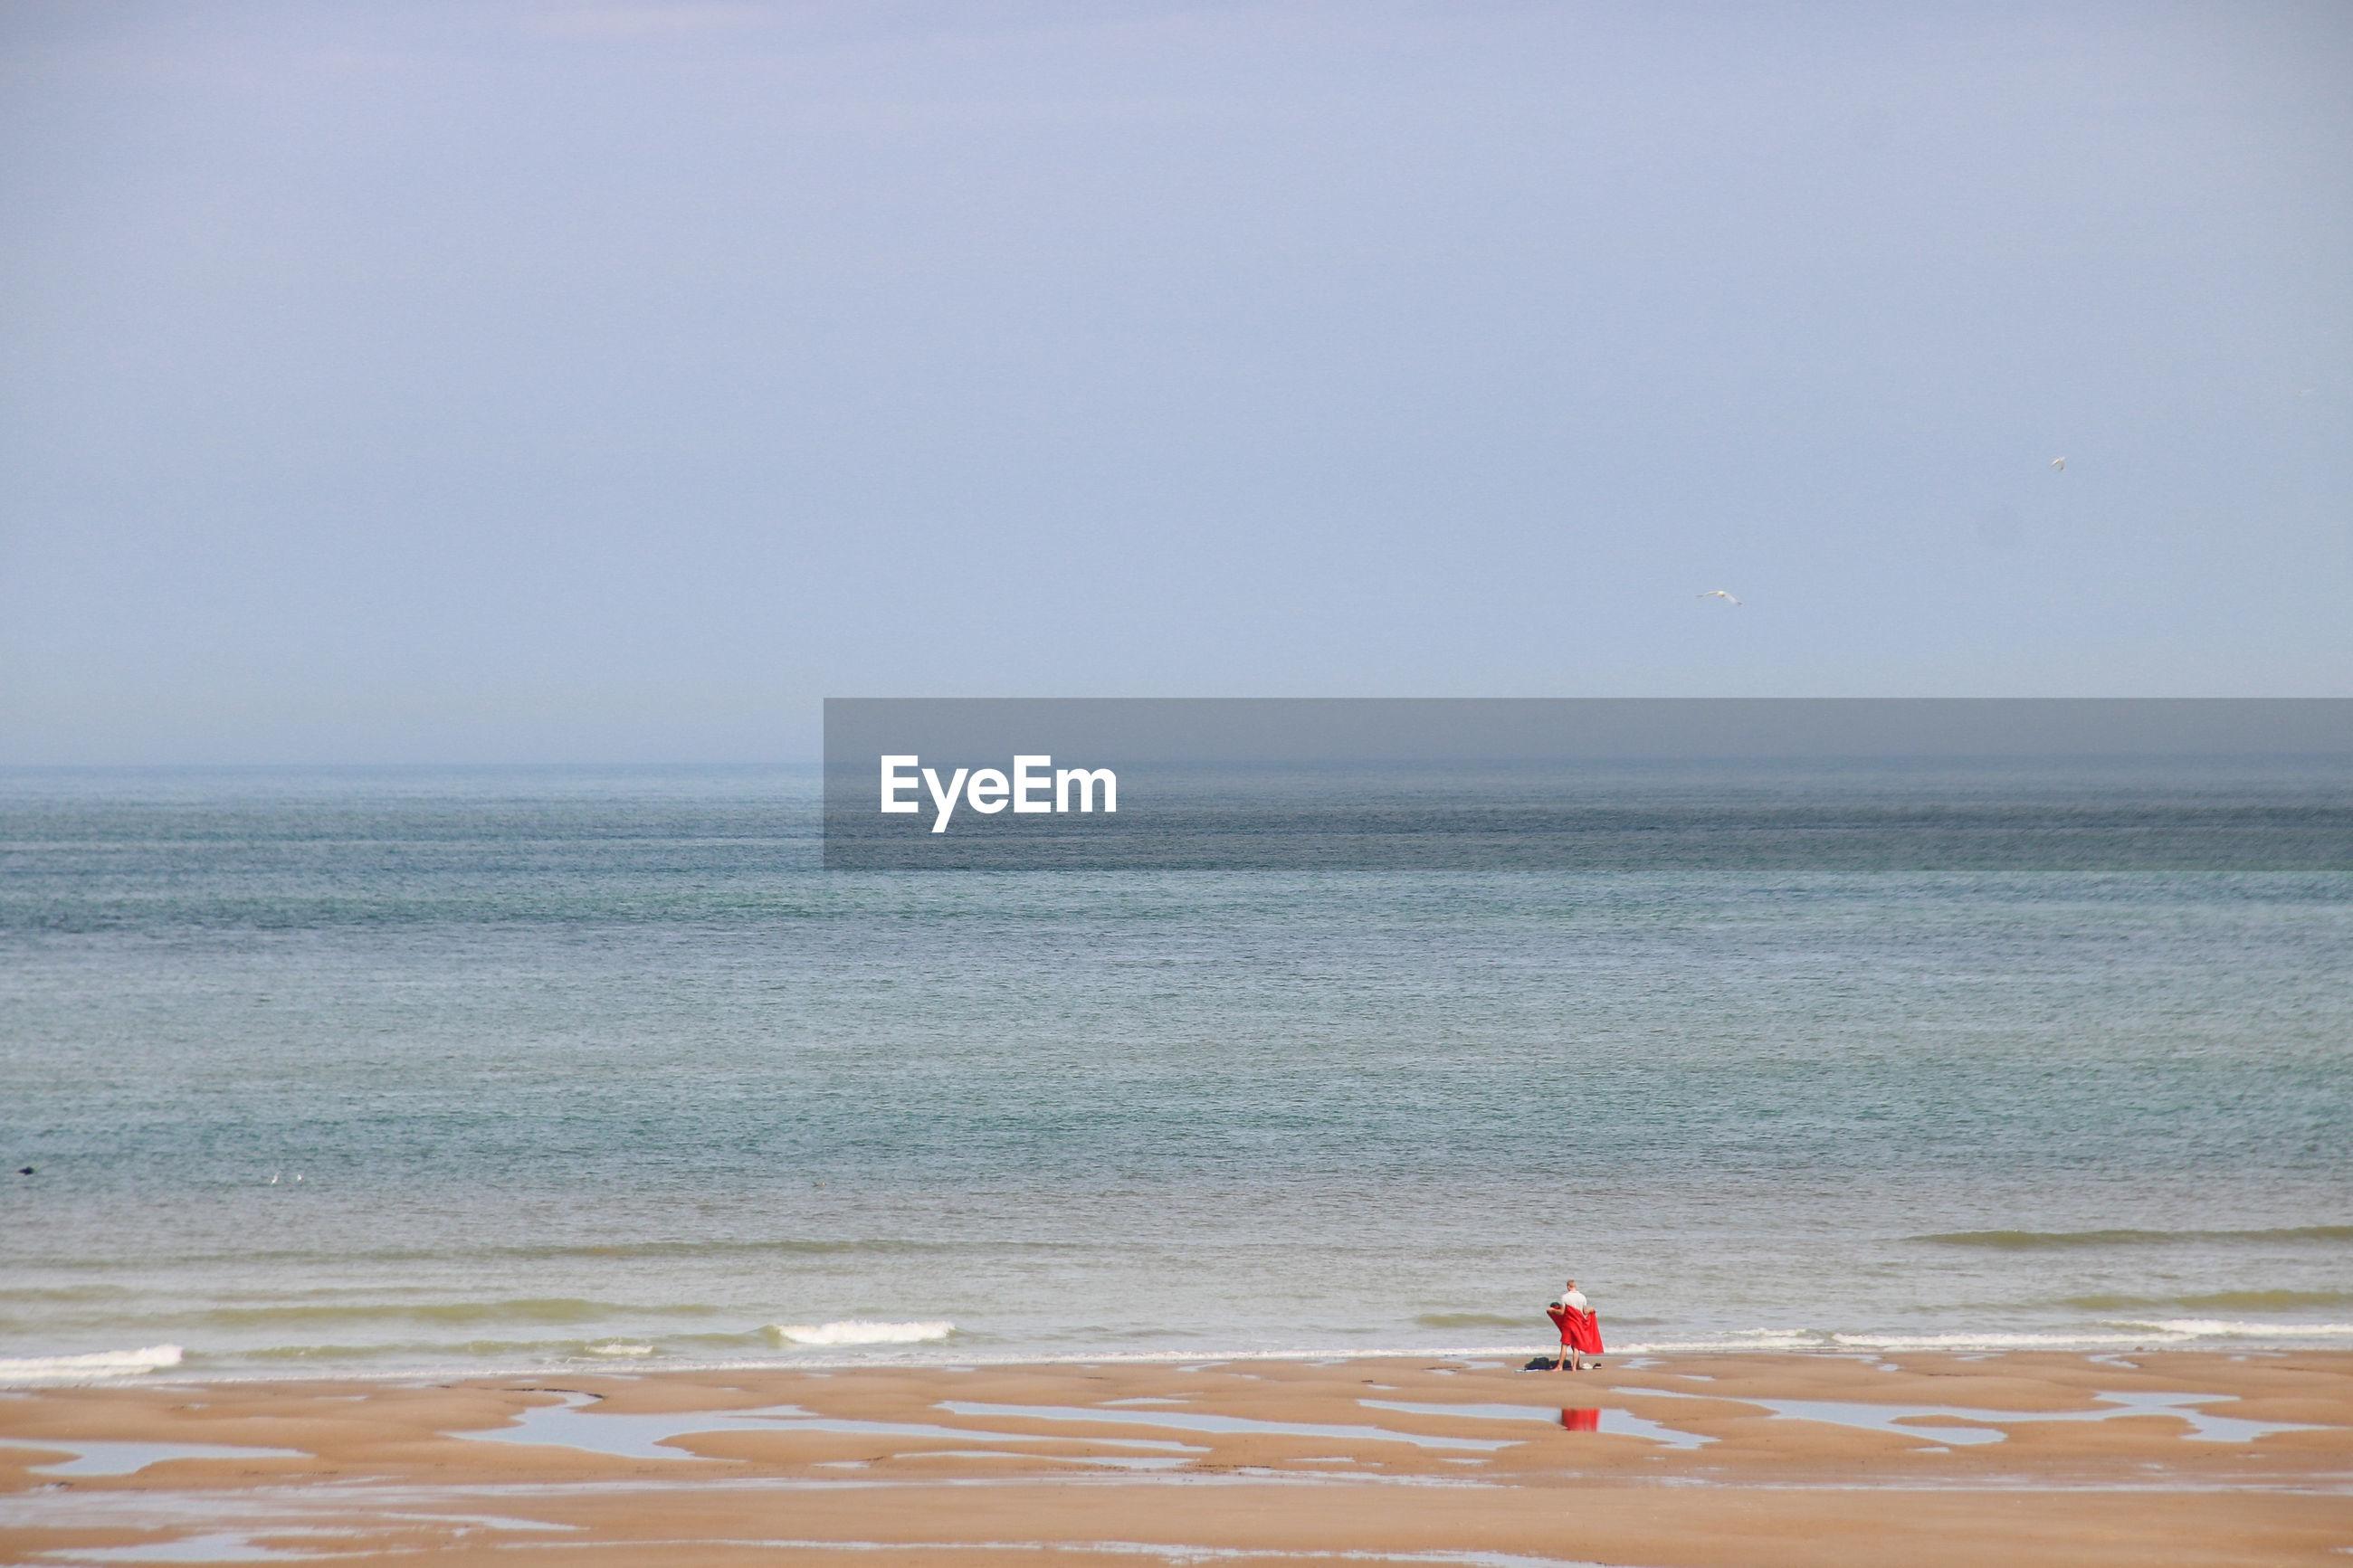 PERSON ON BEACH AGAINST SKY